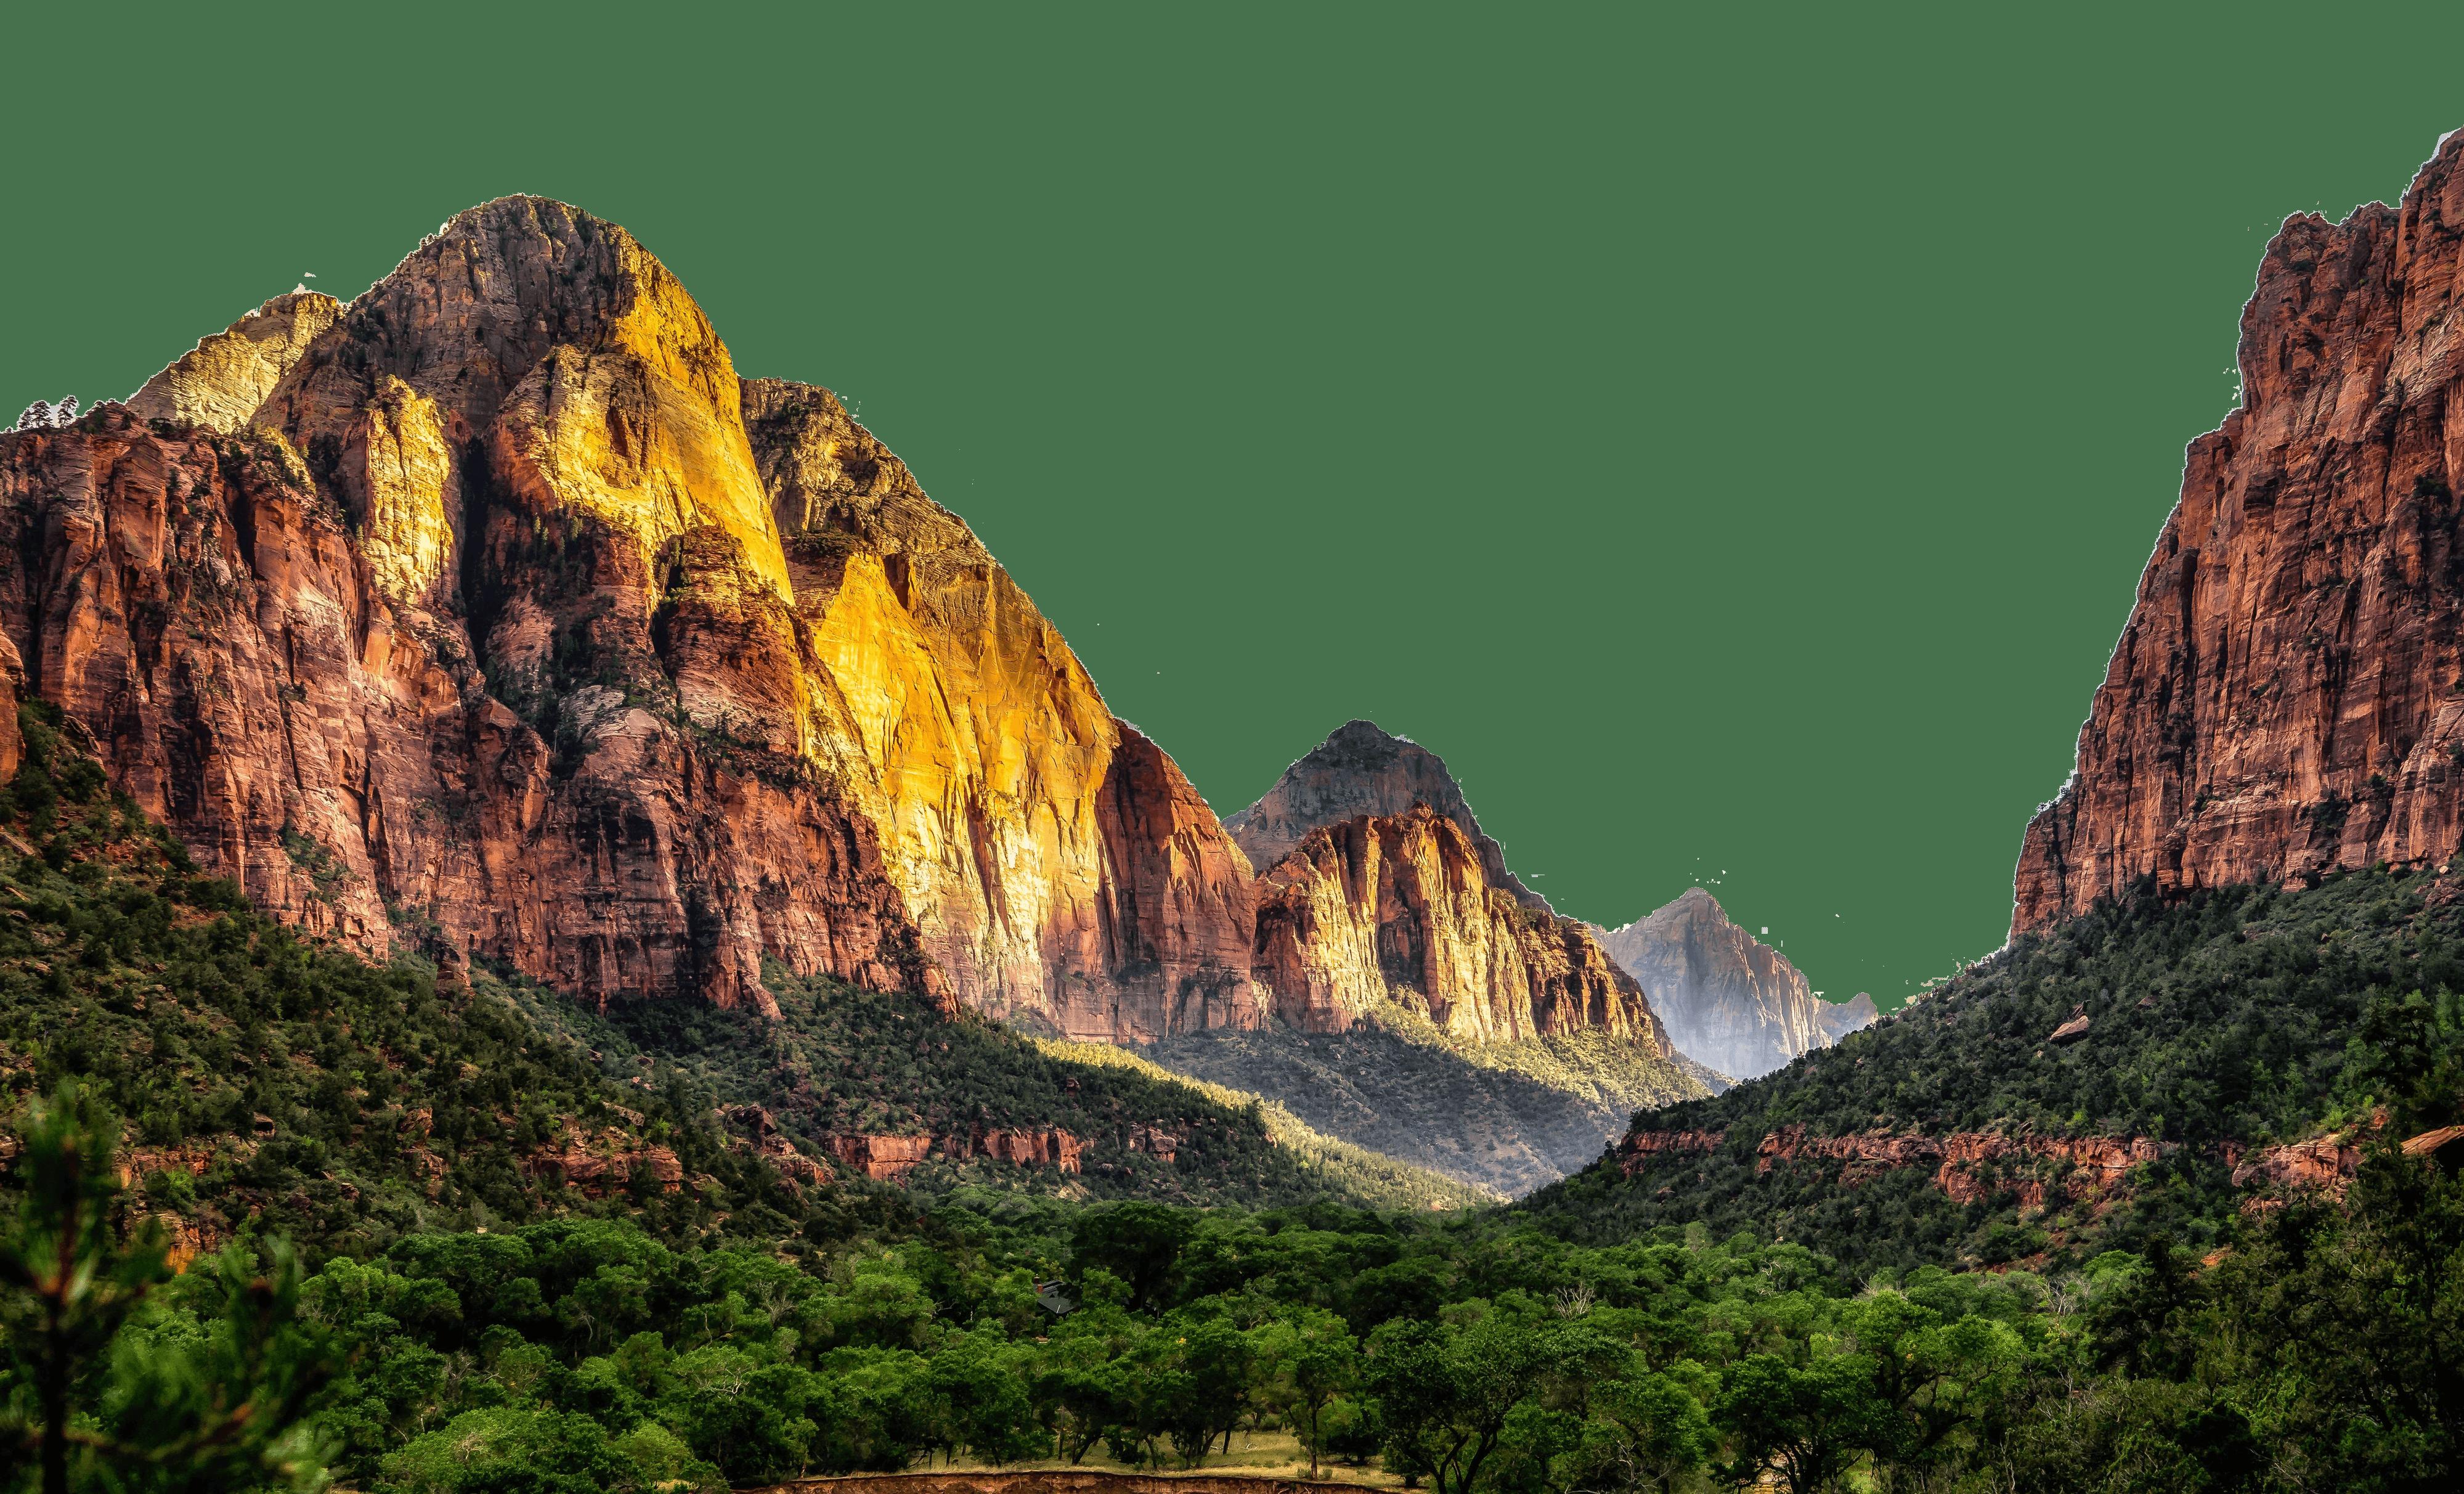 8K Mountain Wallpapers - Top Free 8K Mountain Backgrounds ...